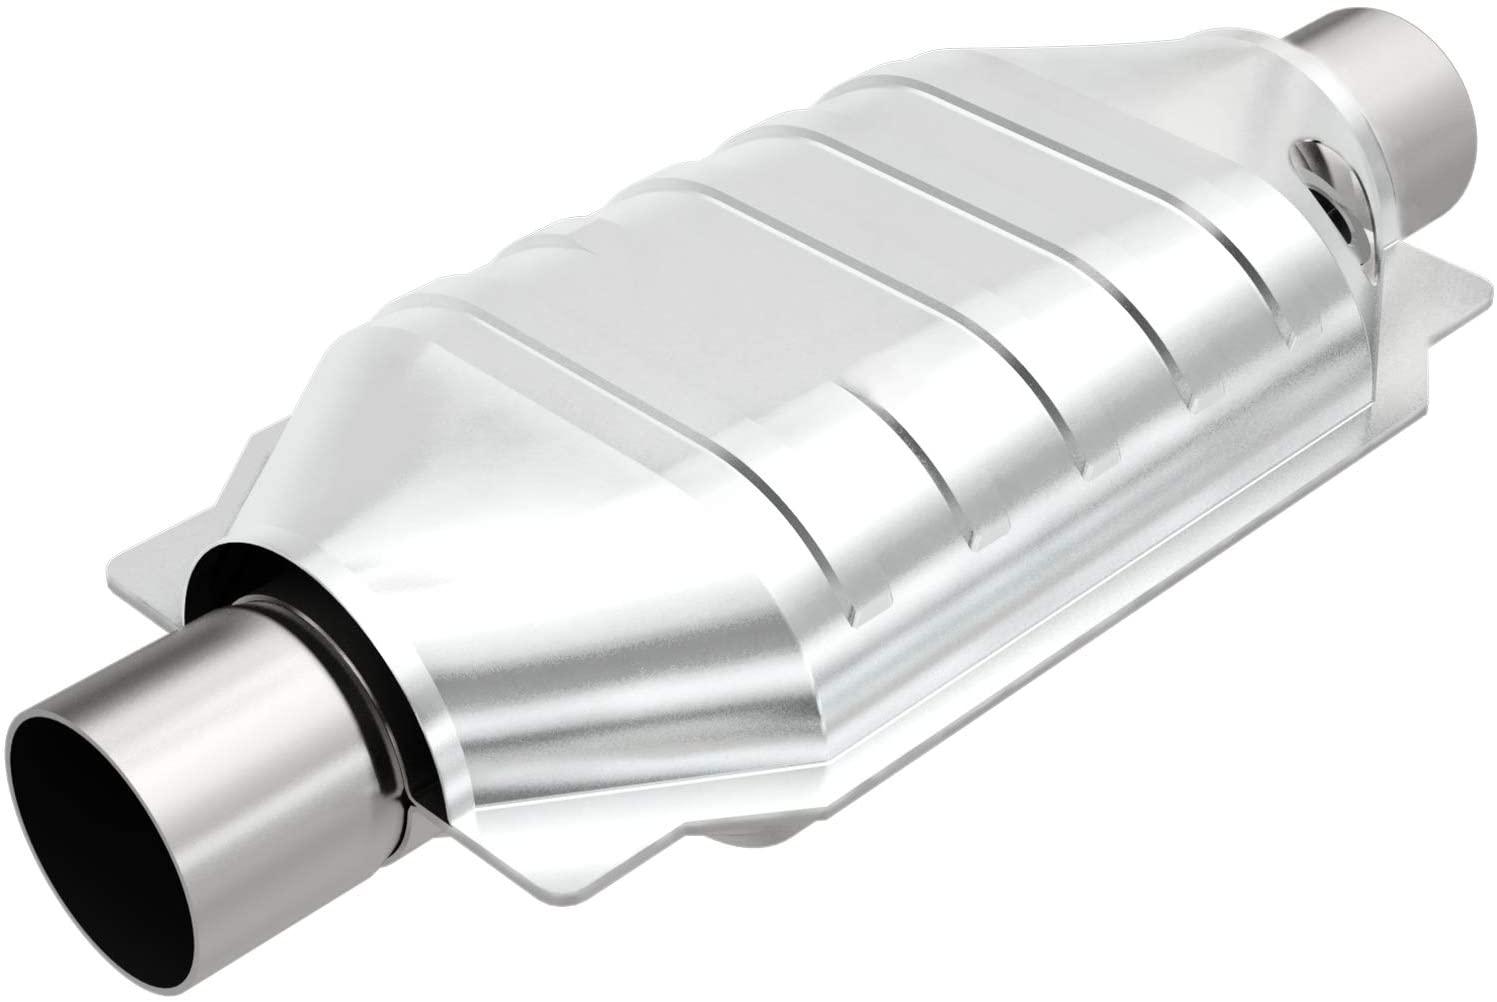 MagnaFlow 545035 Universal Catalytic Converter (CARB Compliant)